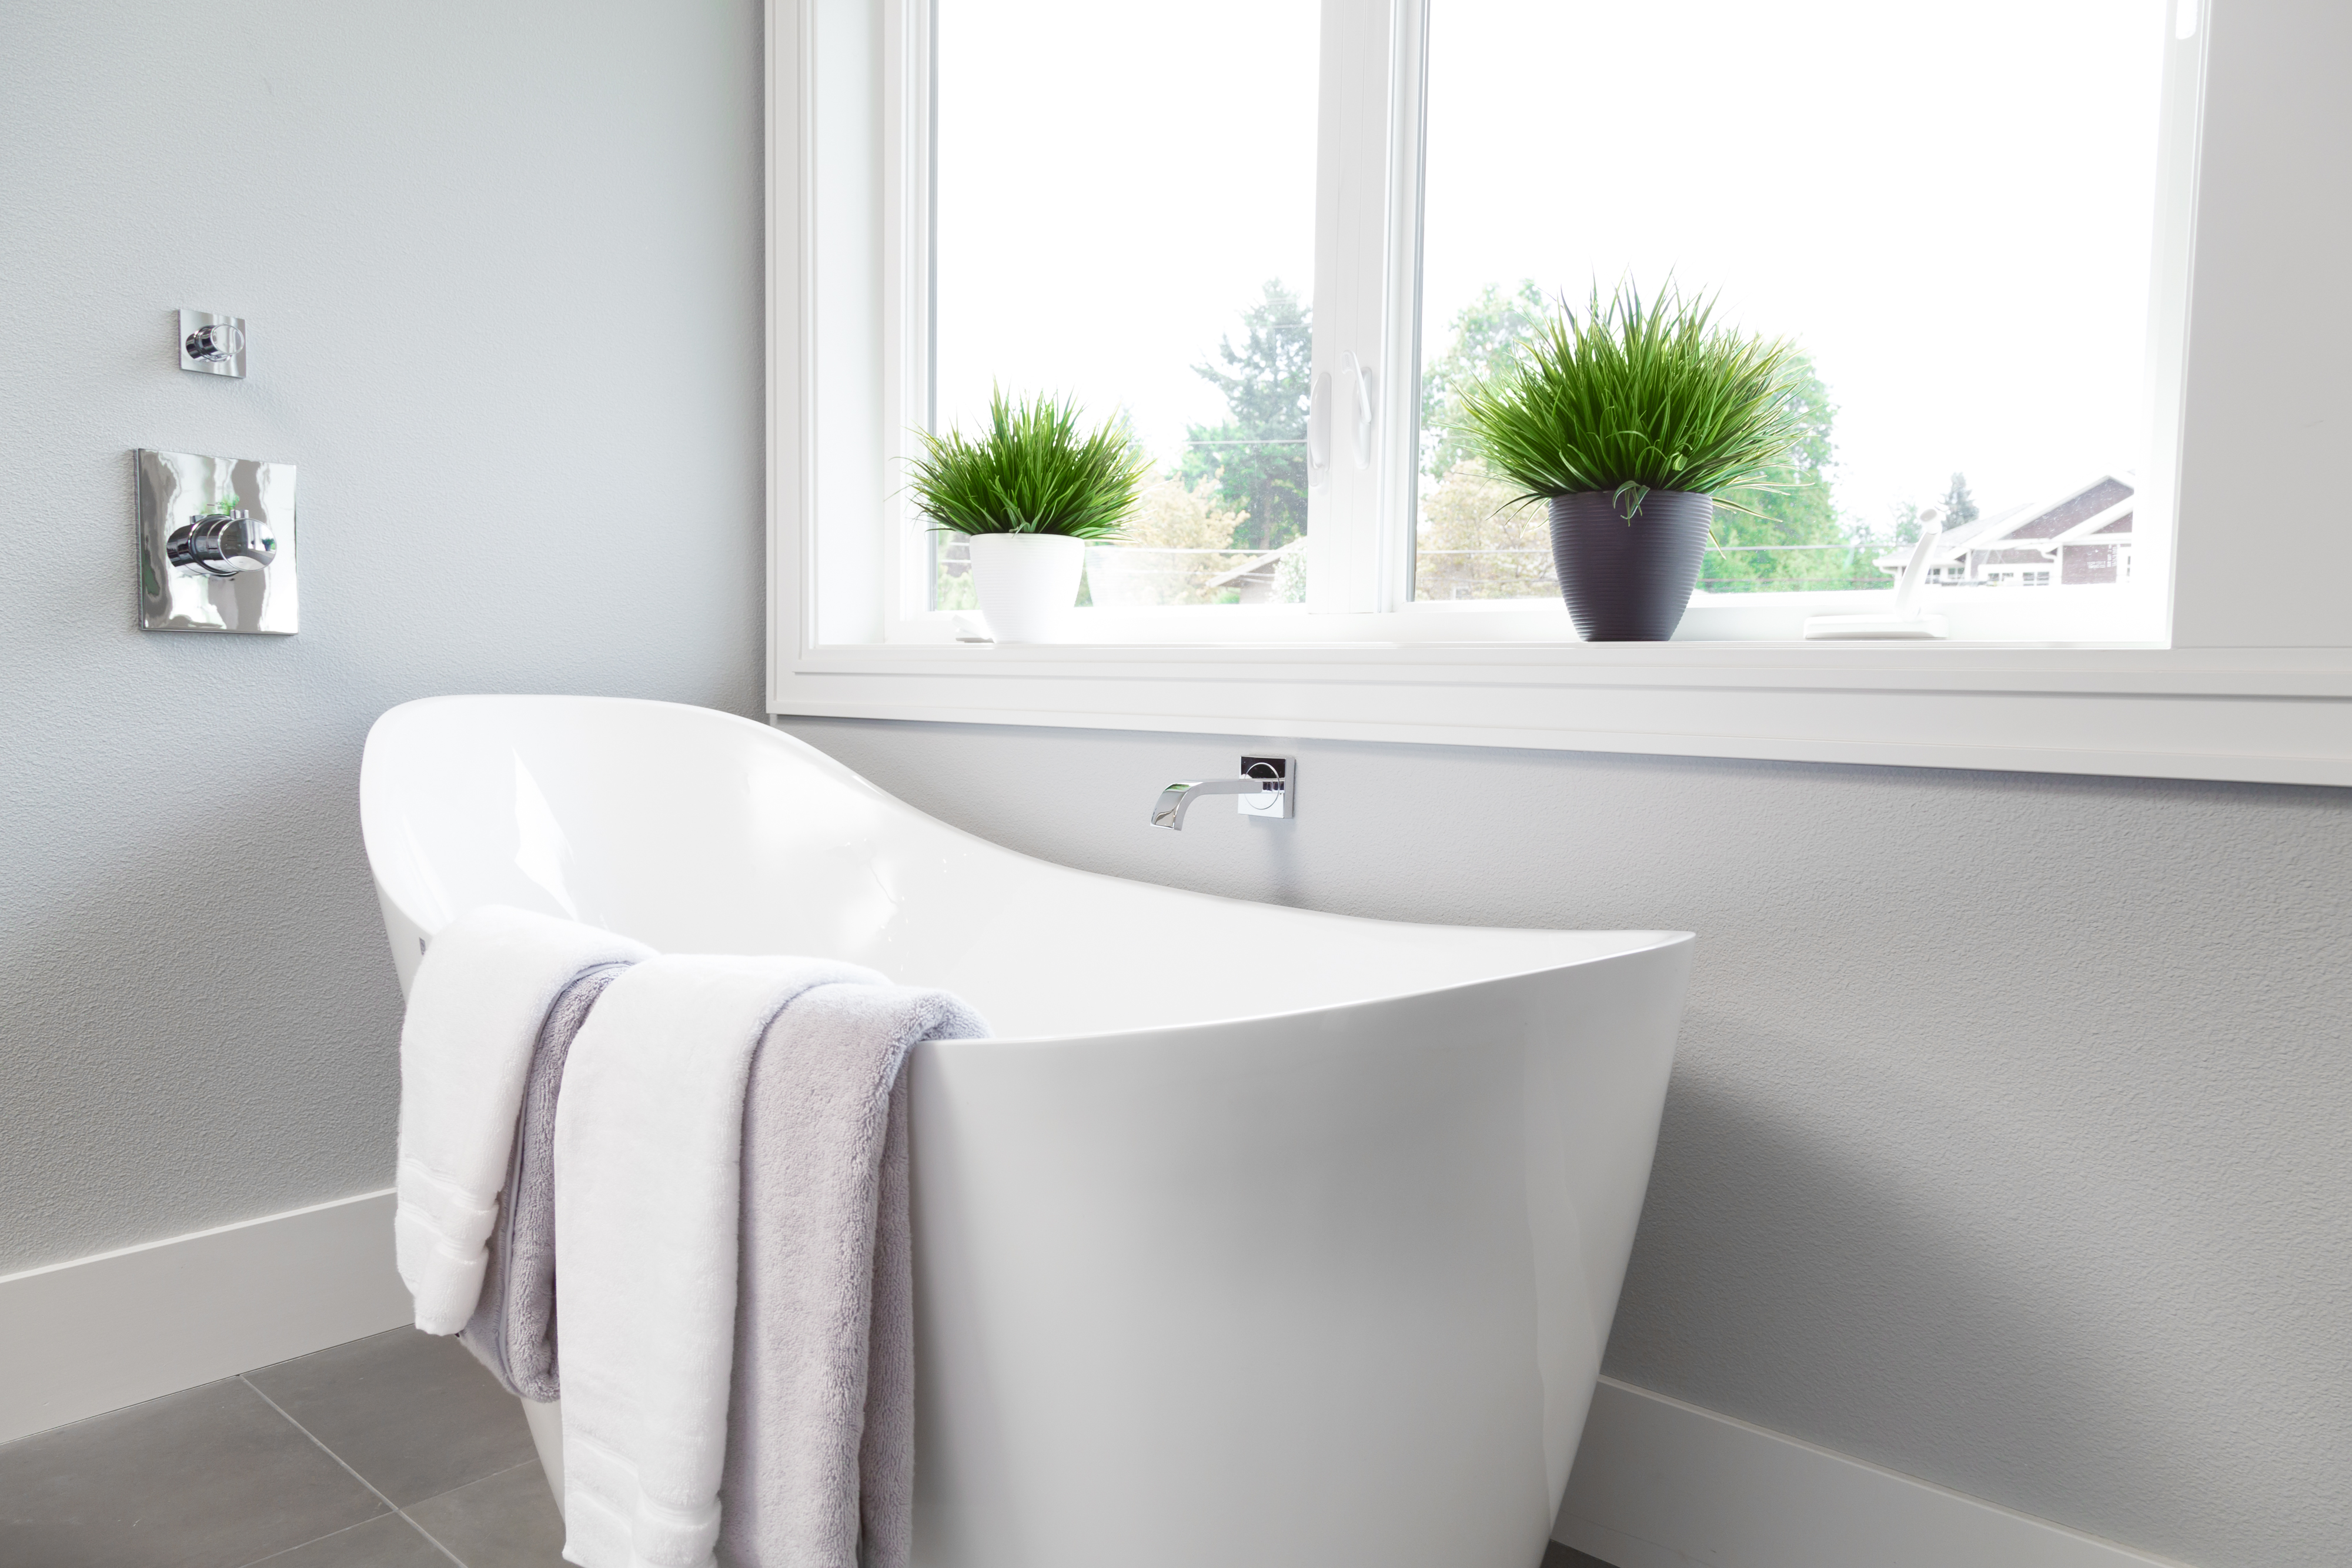 Photo of bathtub